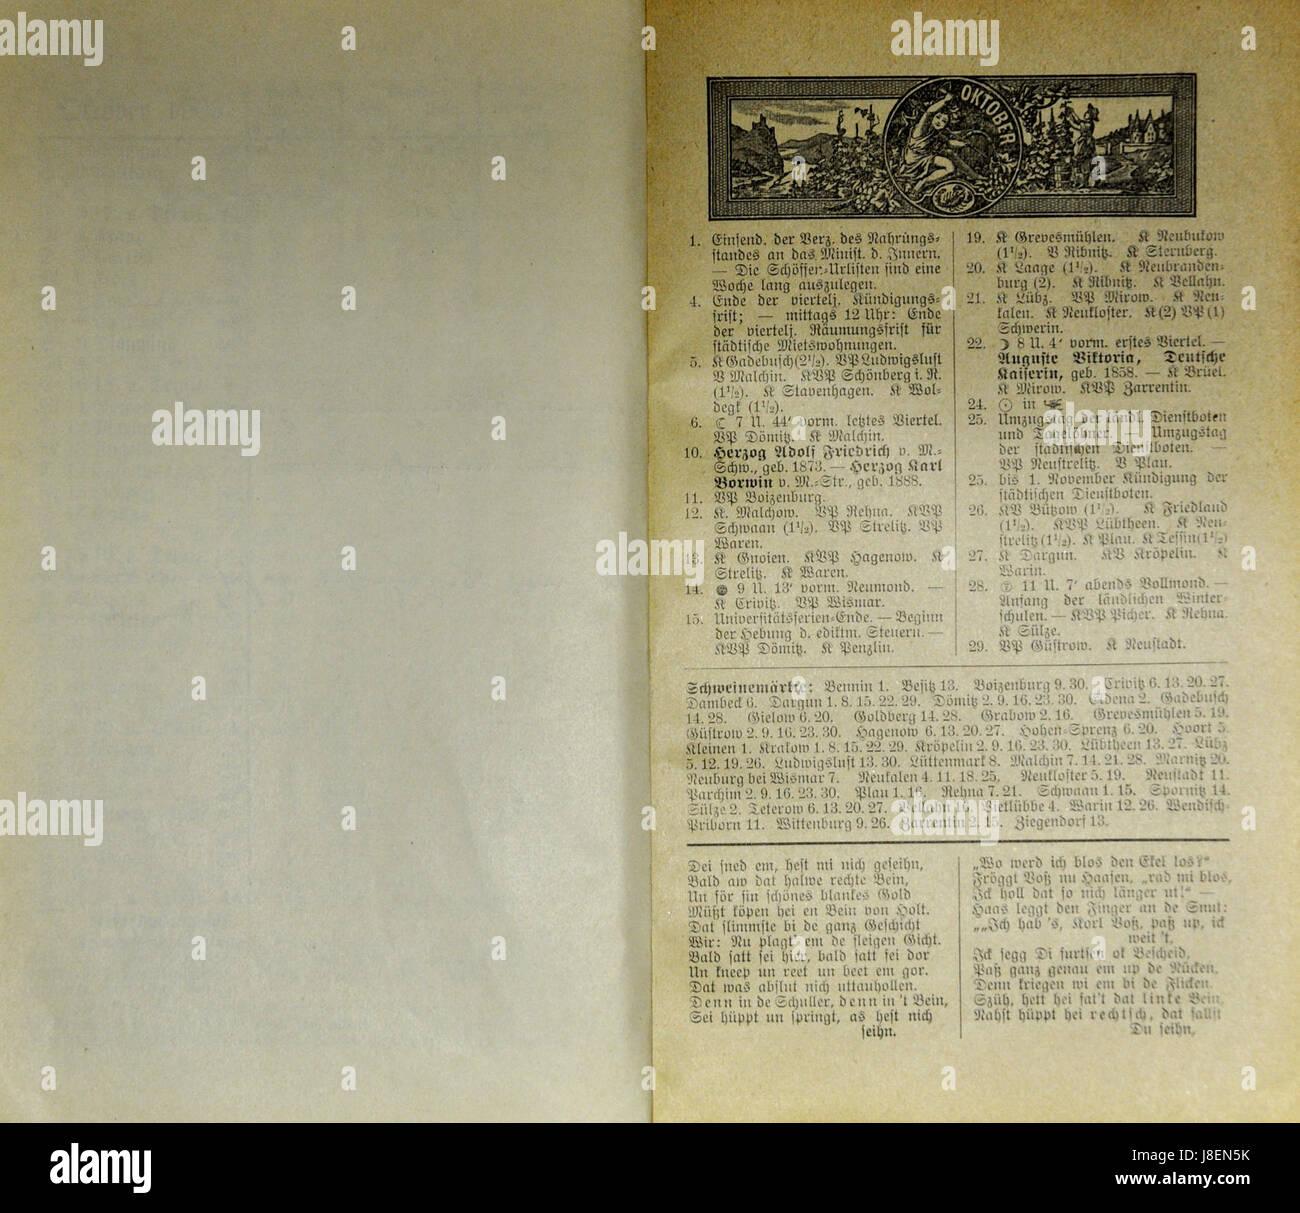 Mecklenburgischer Kalender 1909 022 Stock Photo